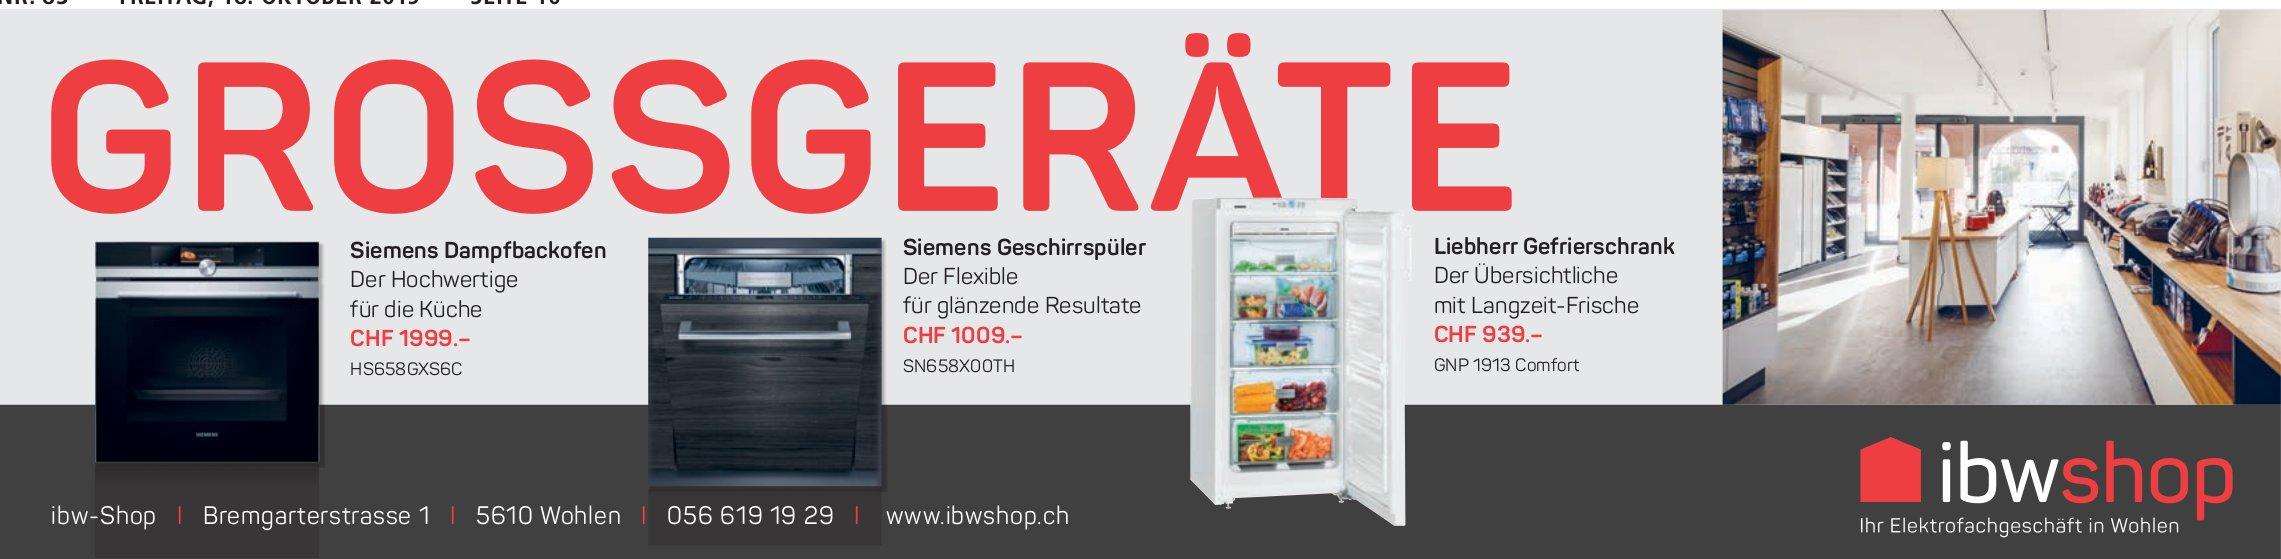 IbwShop Grossgeräte